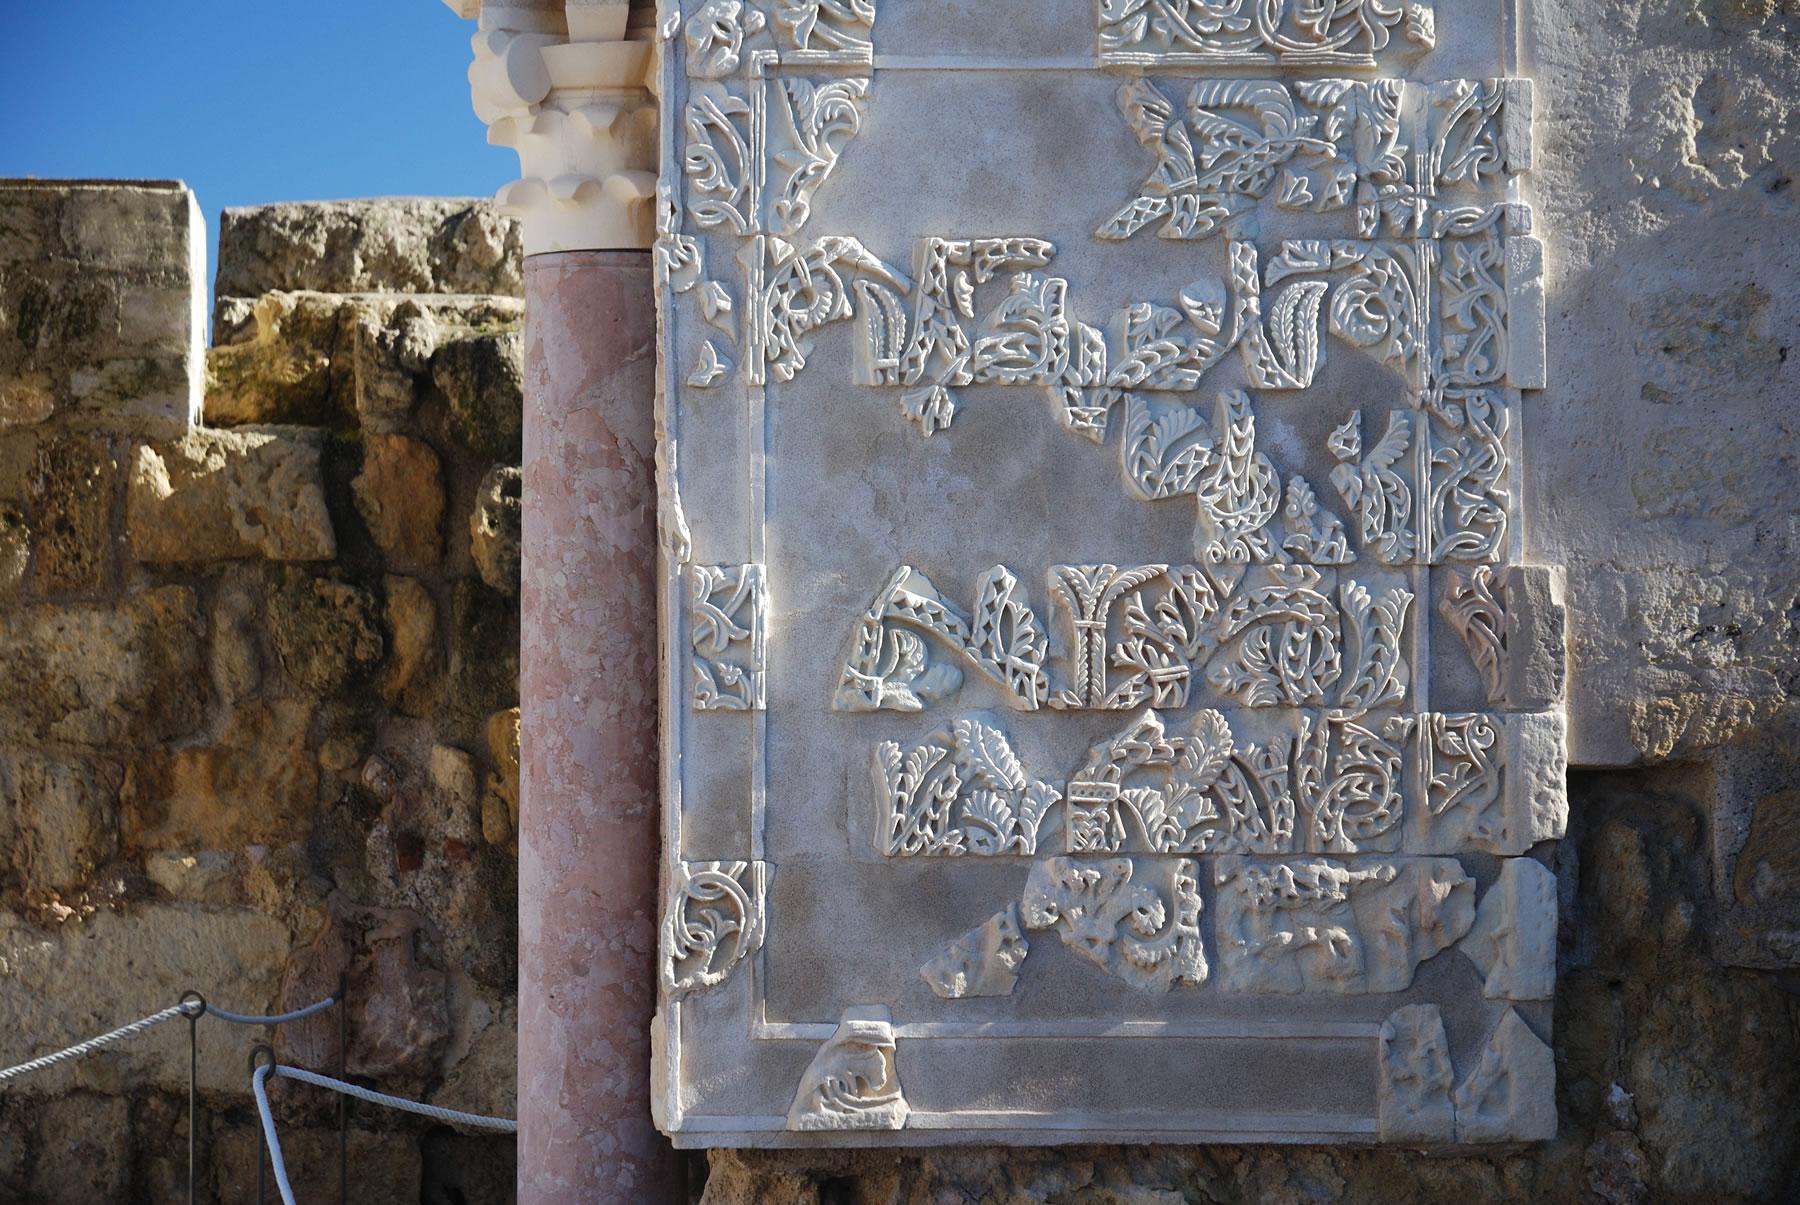 Omeyas bit cora almendr n - Medina azahara decoracion ...